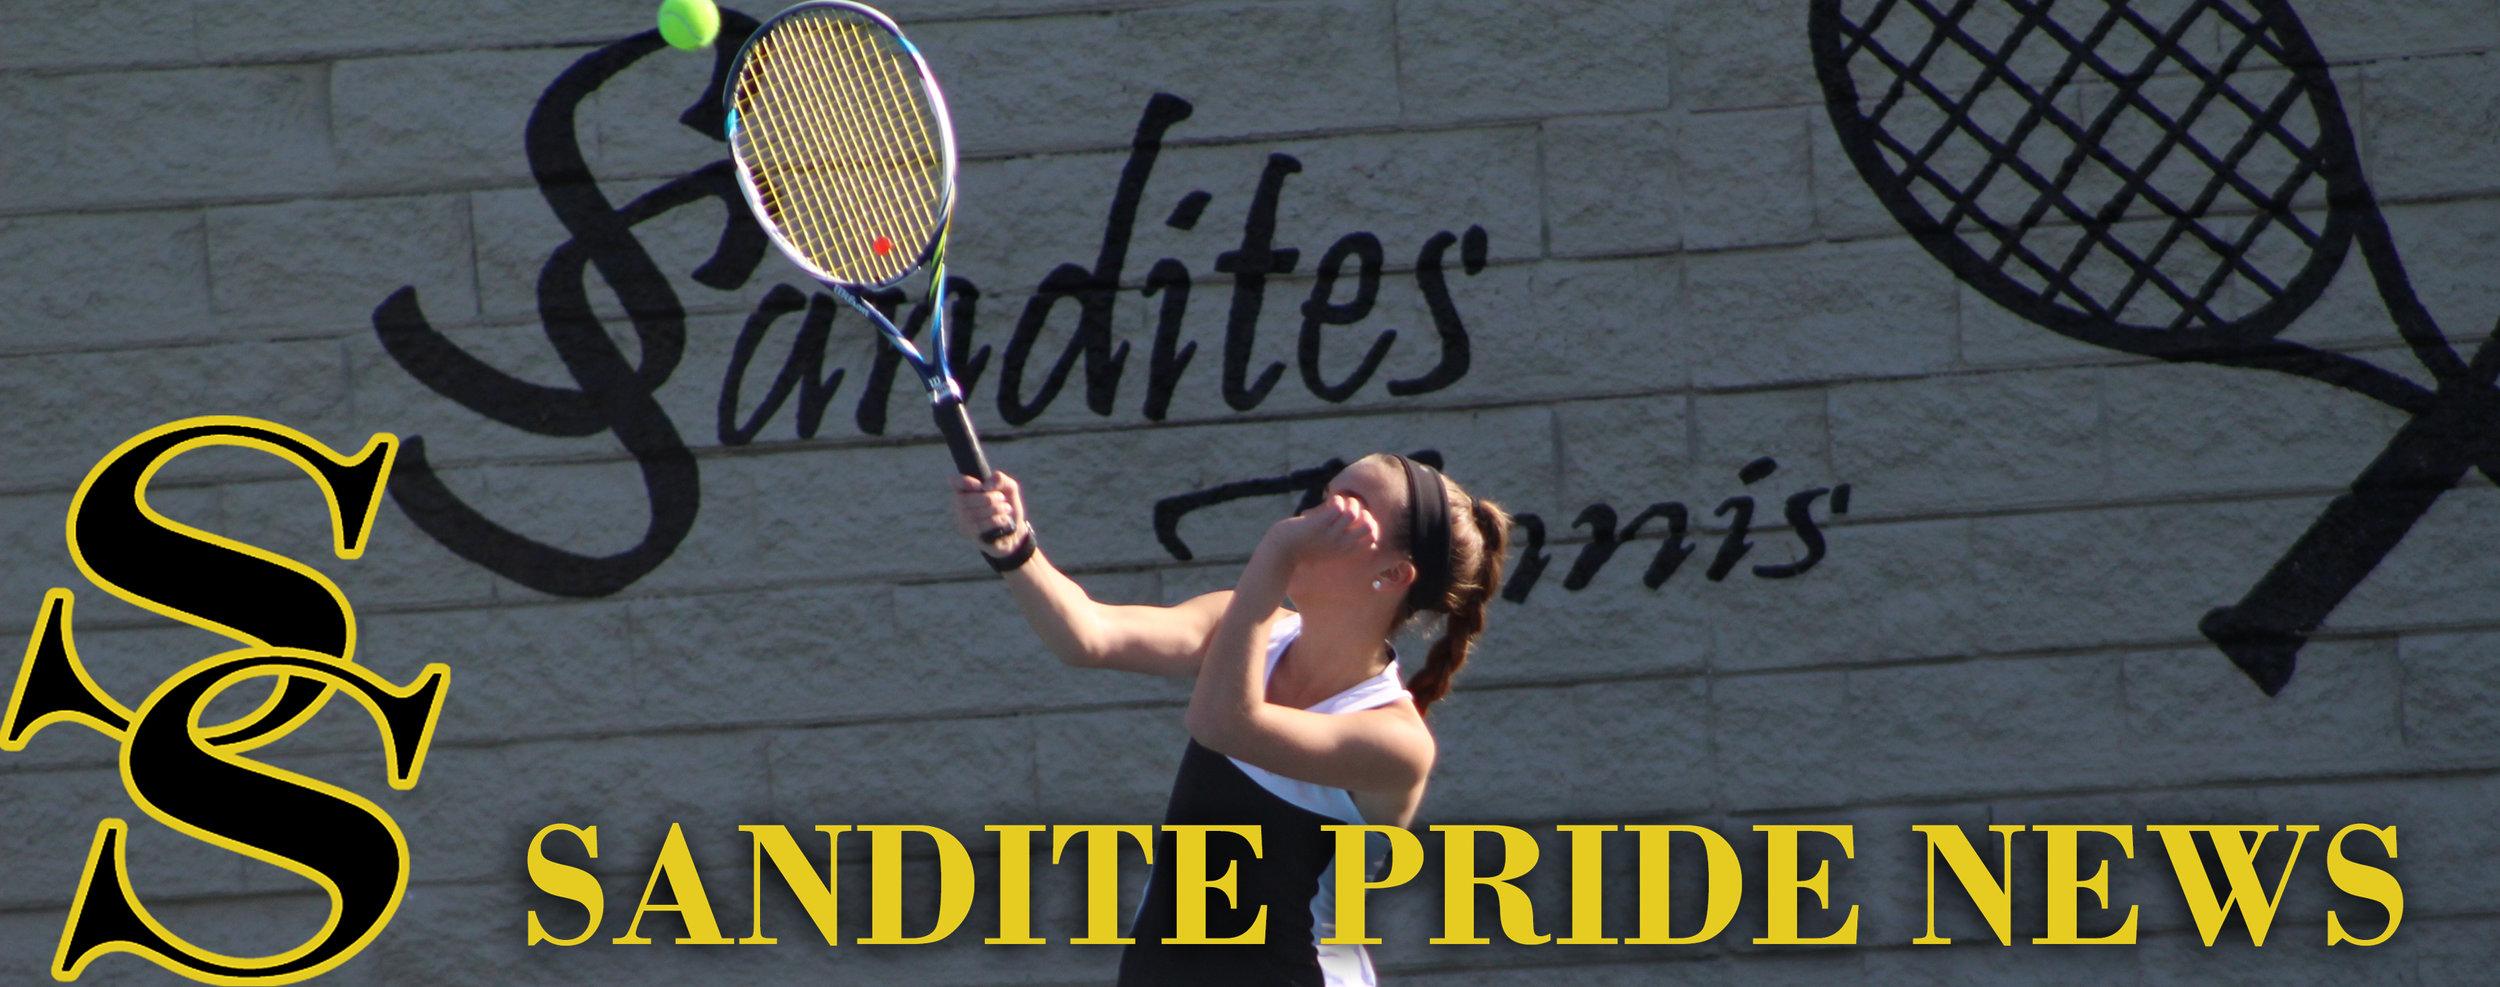 Girls Tennis Sandite Pride News